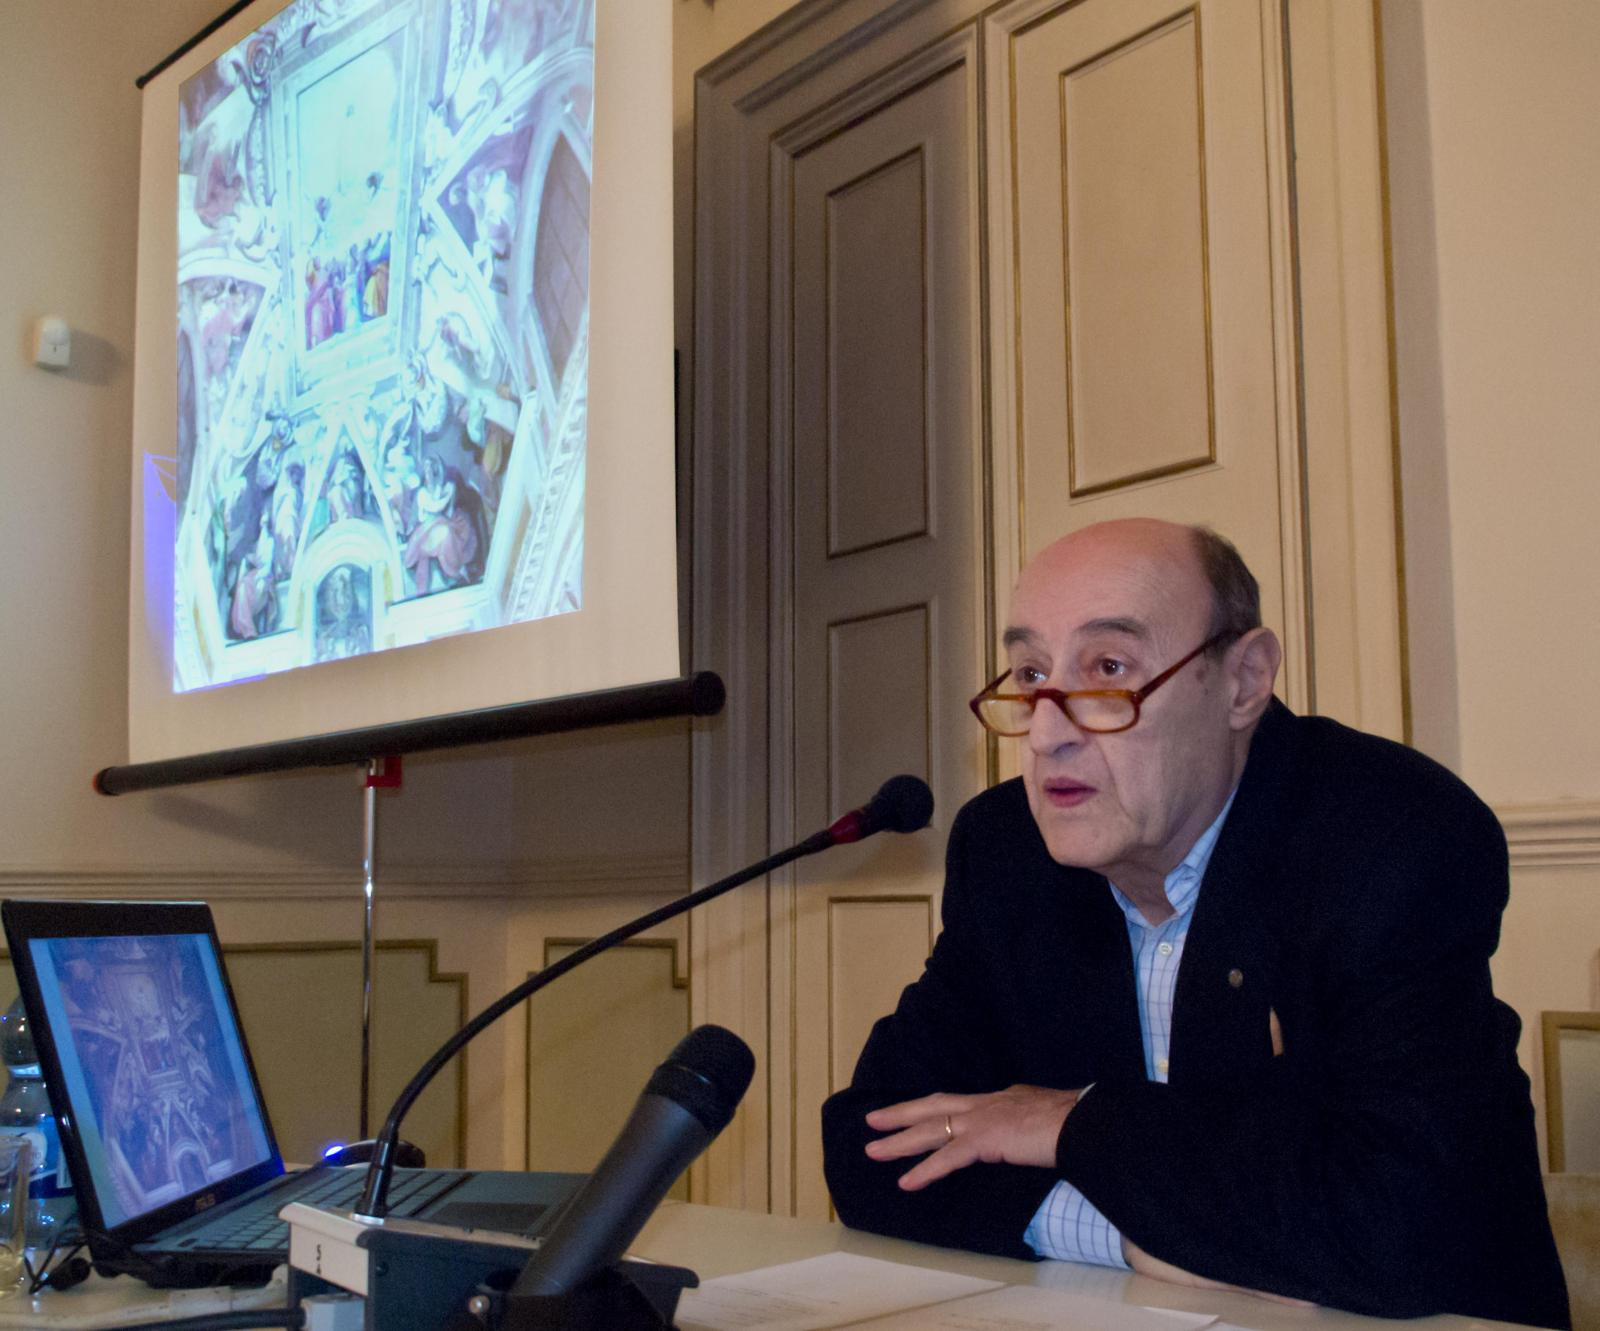 Pier Giorgio Pasini